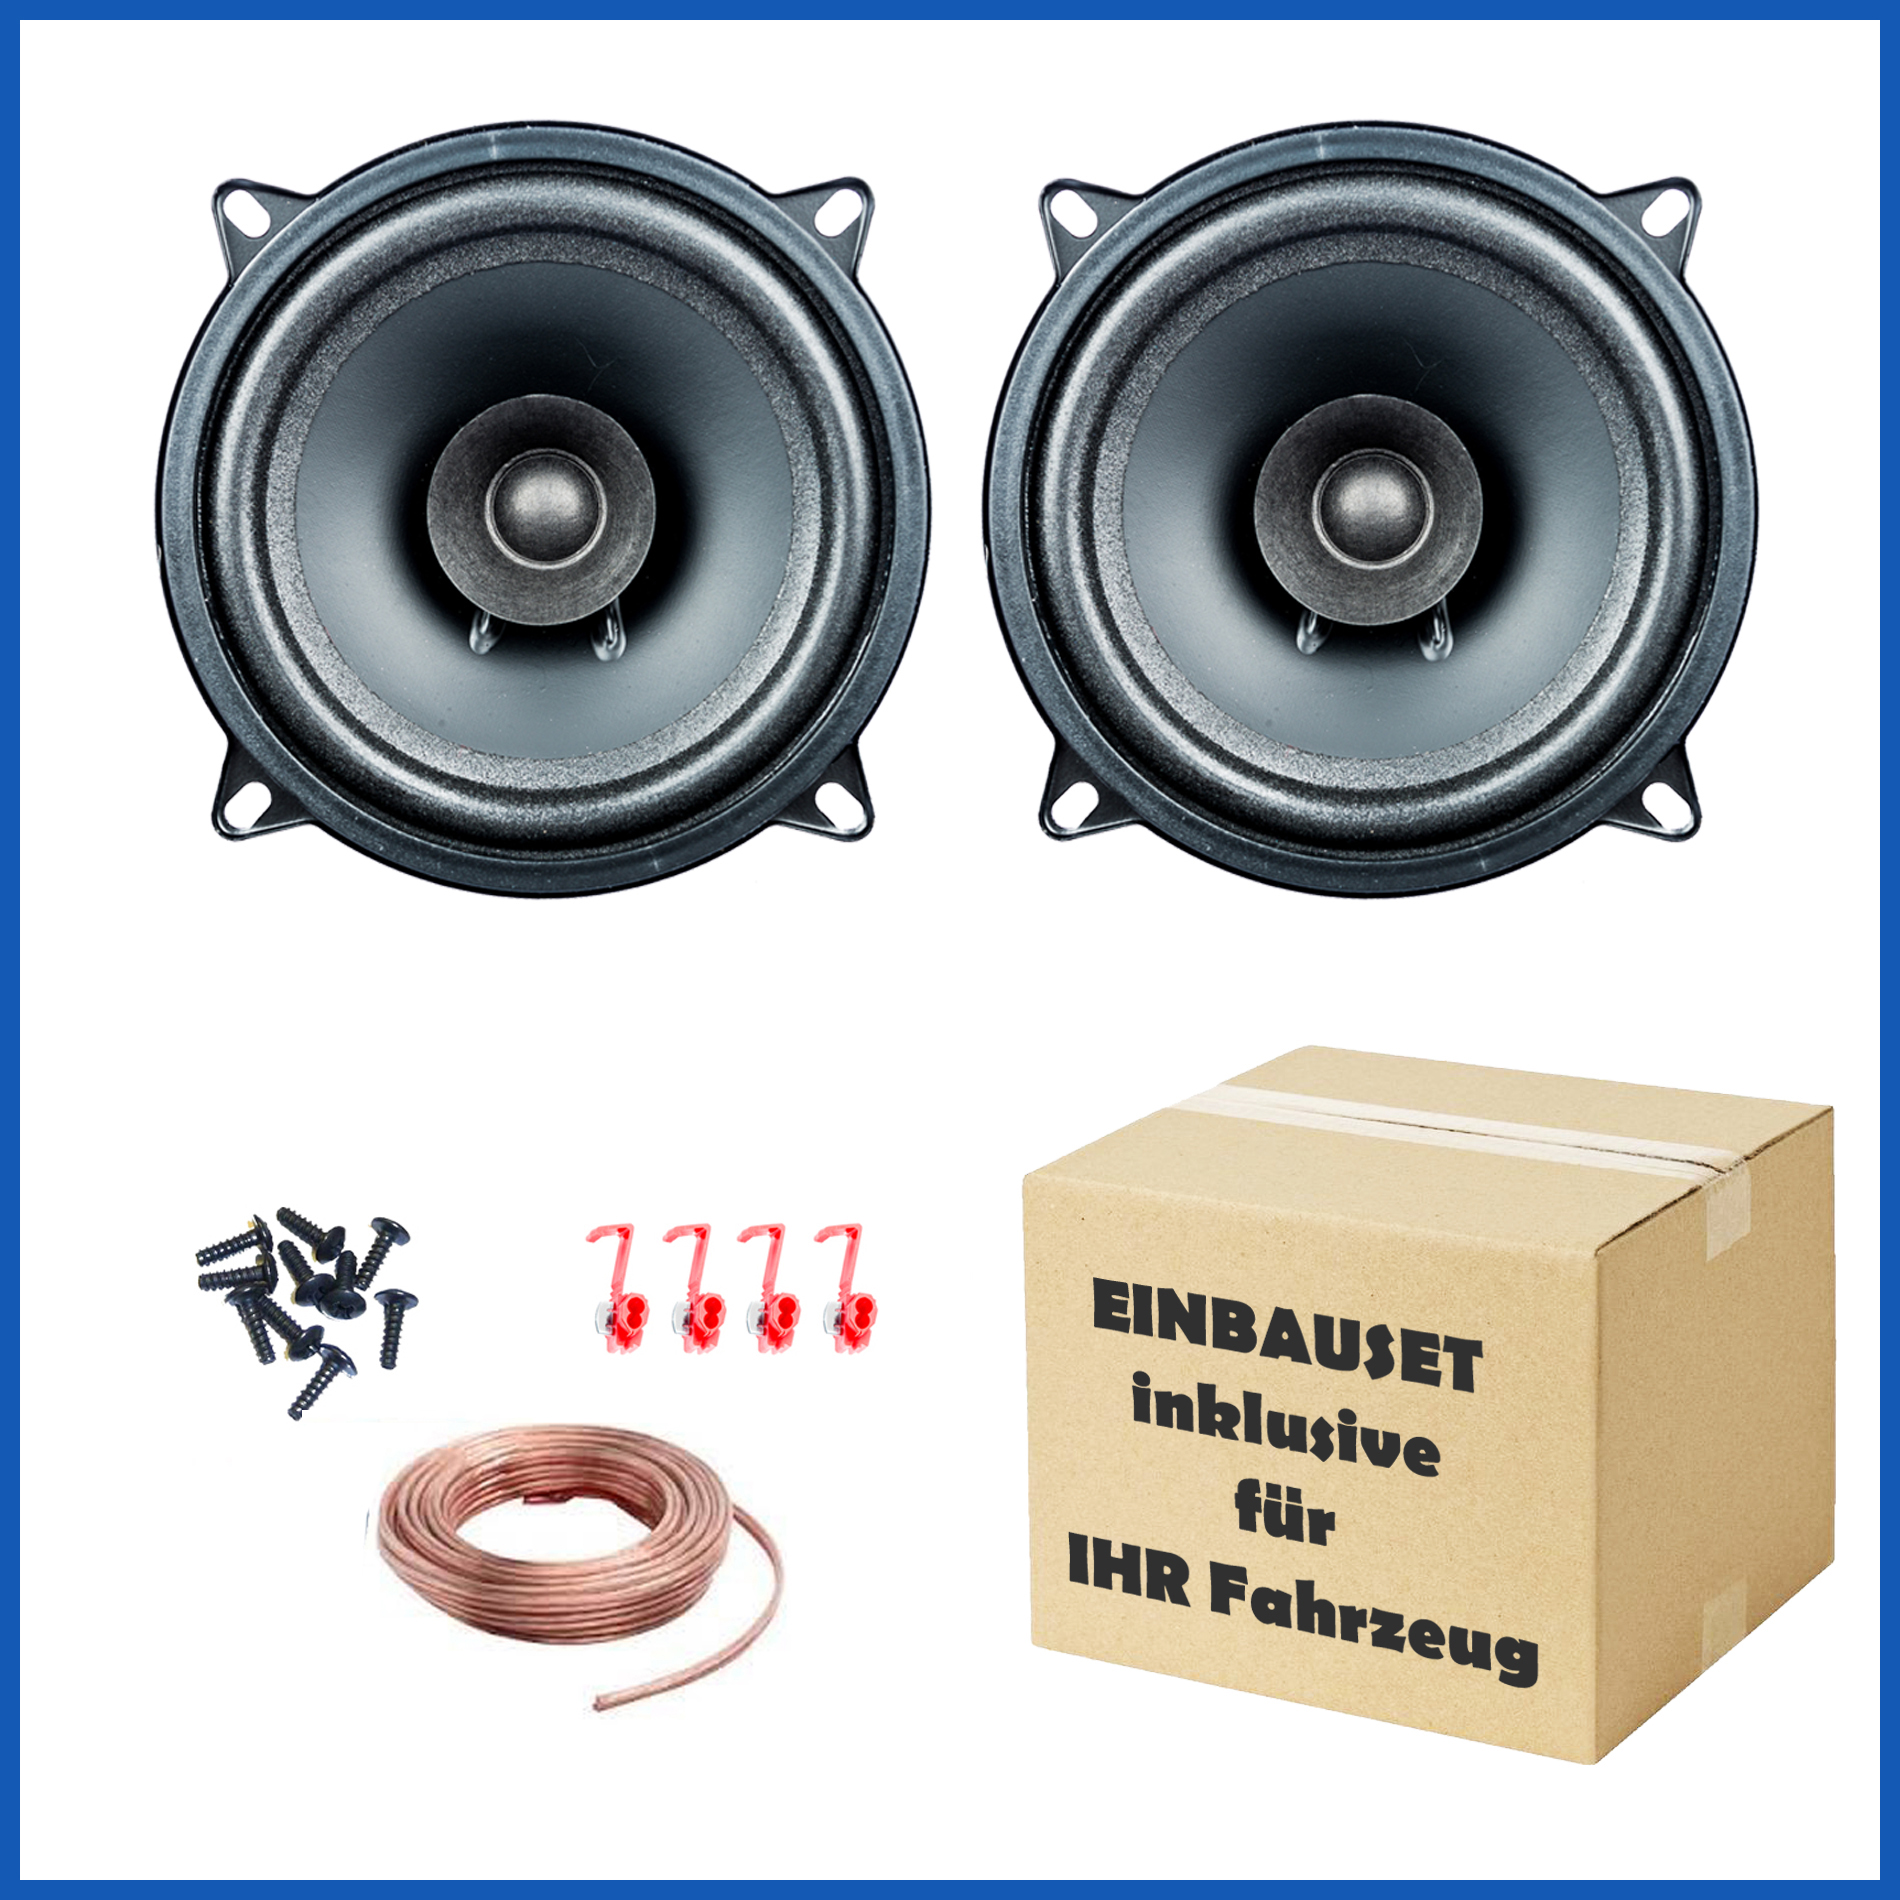 1 Paar PG Audio EVO I 13.2, 13 cm Dual Cone Lautsprecher passend für Alfa Romeo, Fiat, Saab, Smart – Bild 1